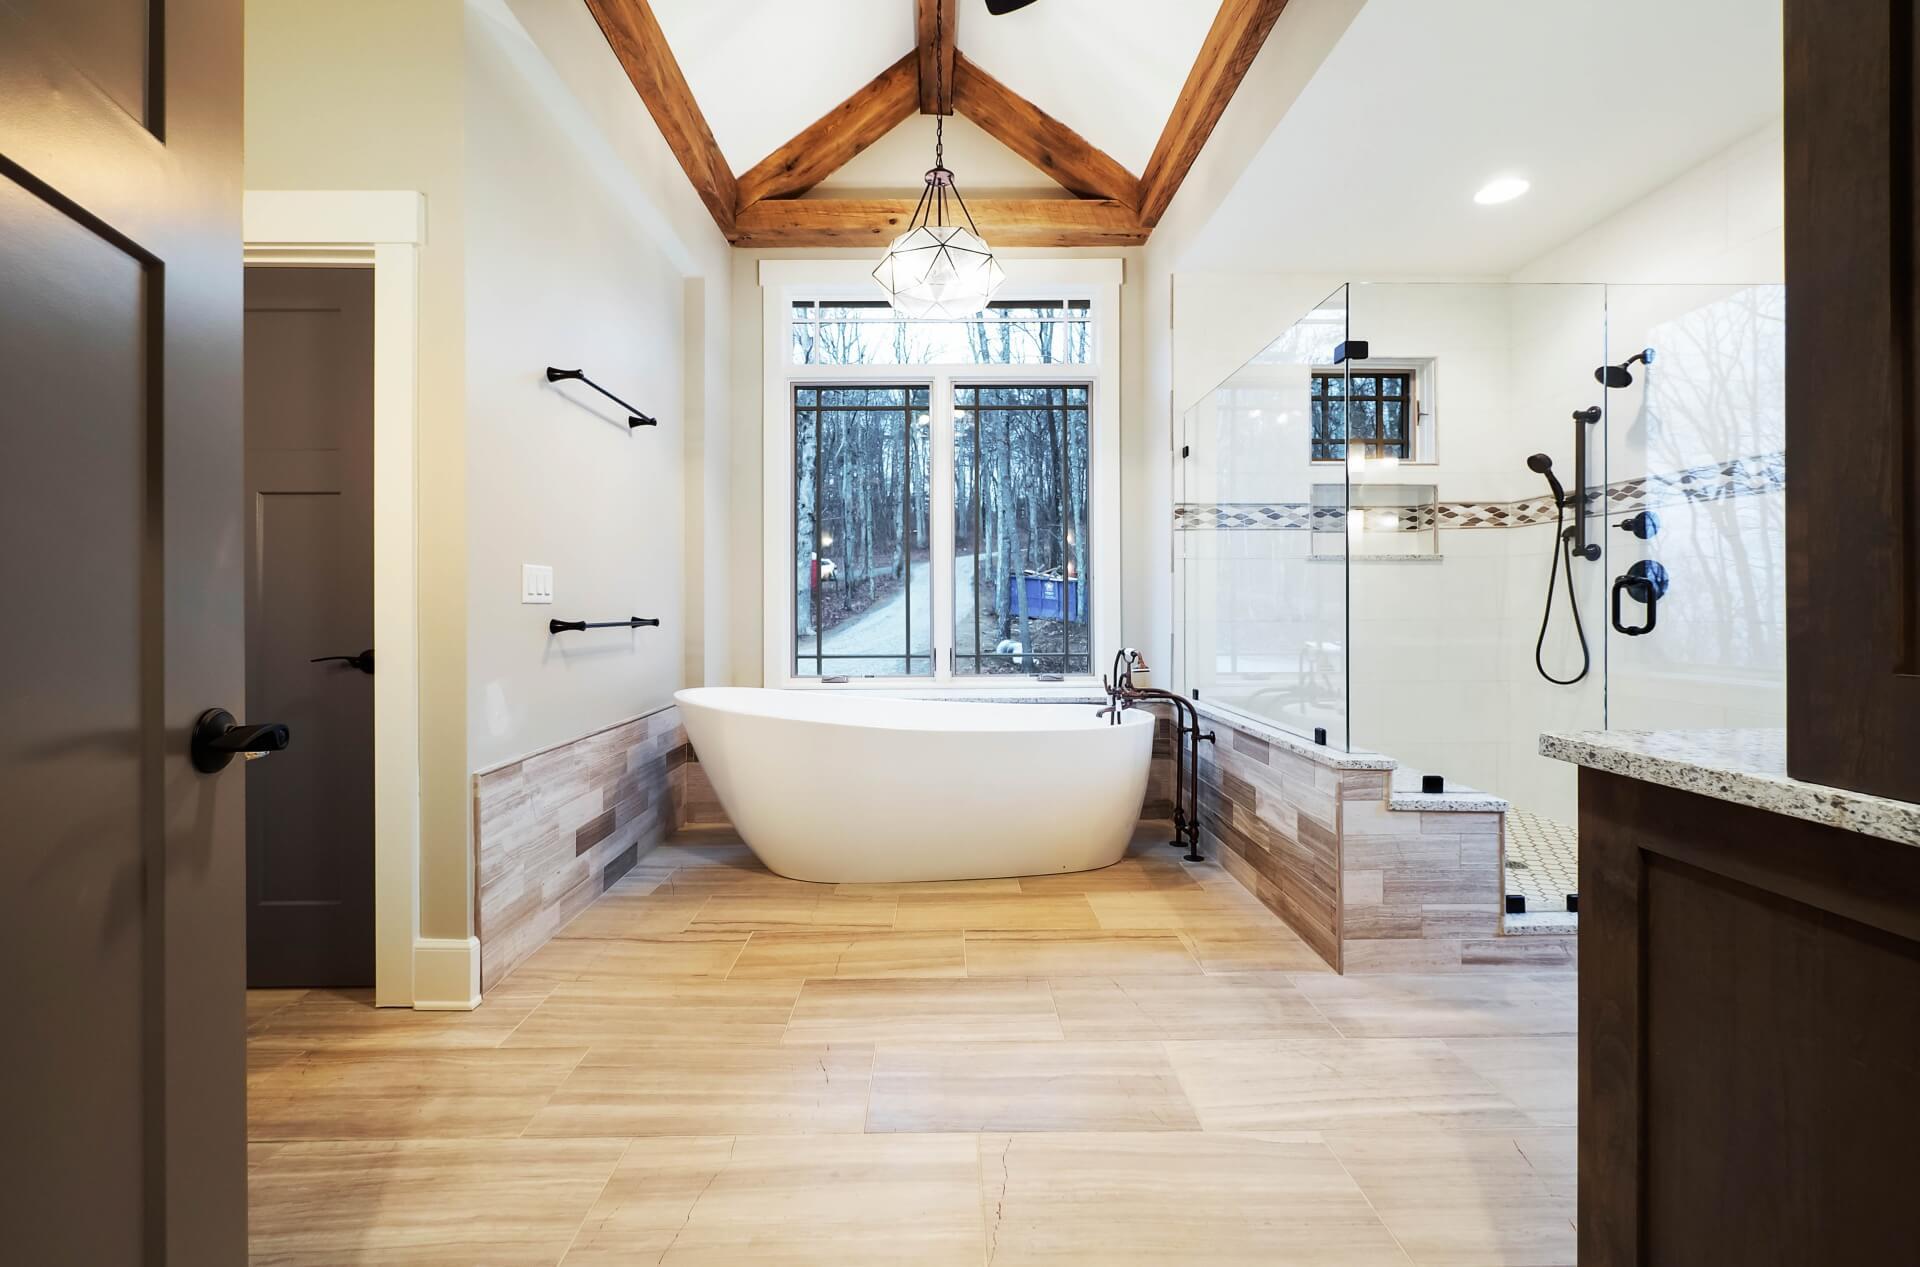 restoration-hardware-rustic-master-bath-1